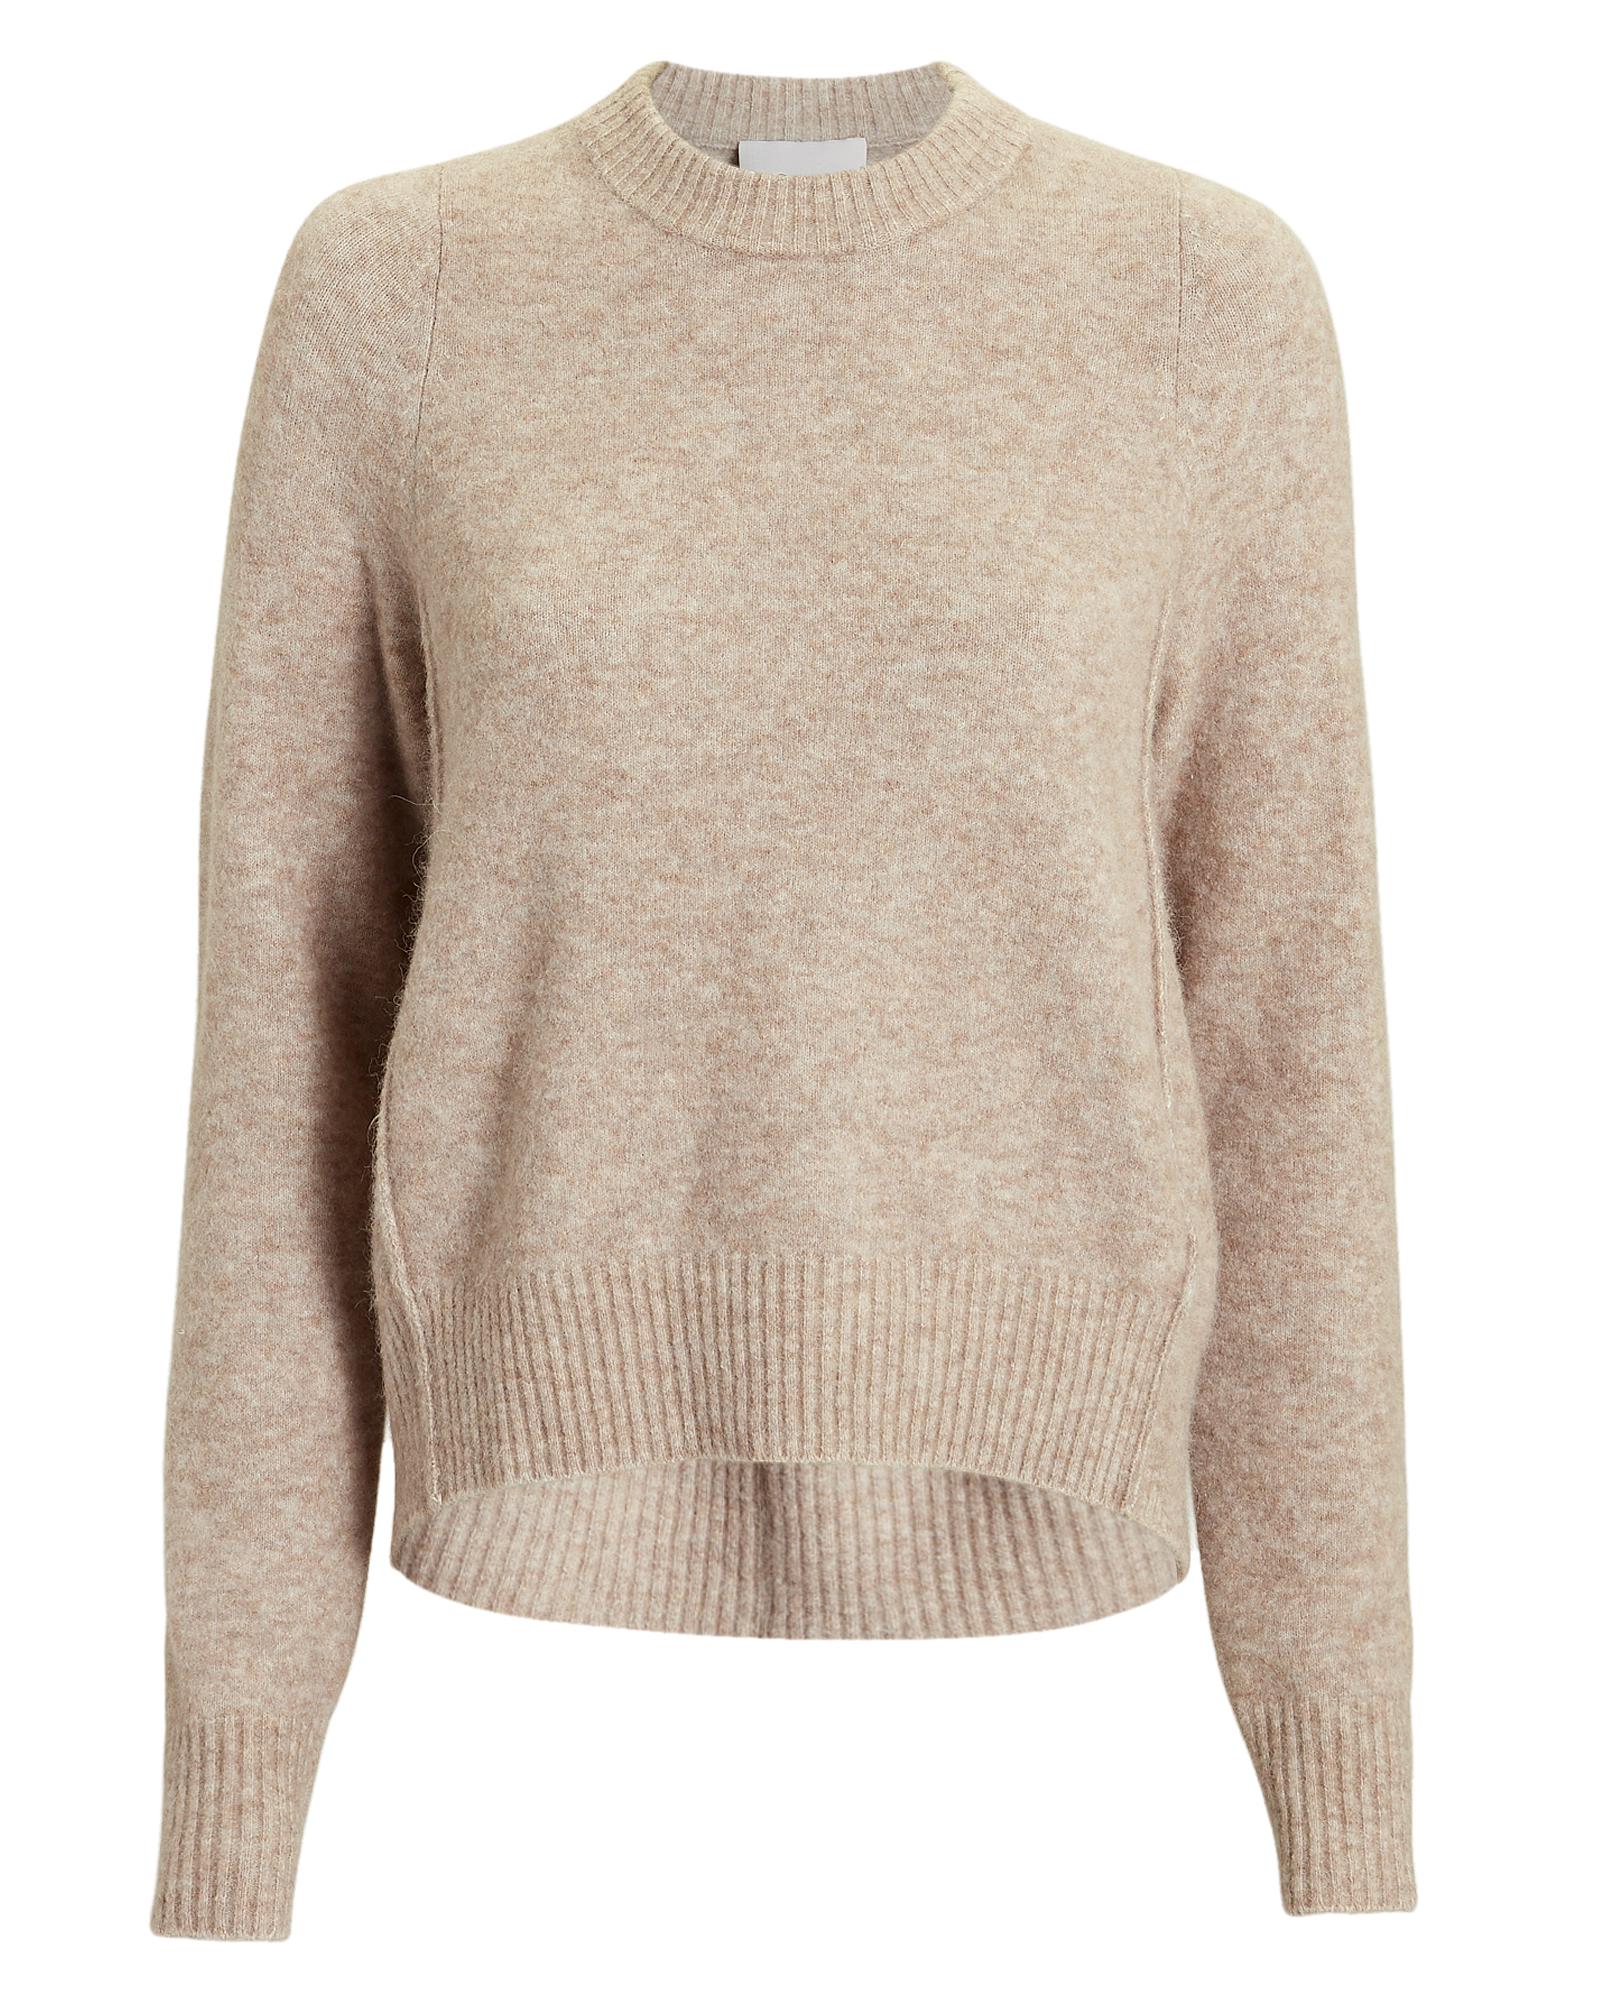 PHILLIP LIM 3.1 Phillip Li Brown High-Low Sweater Brown